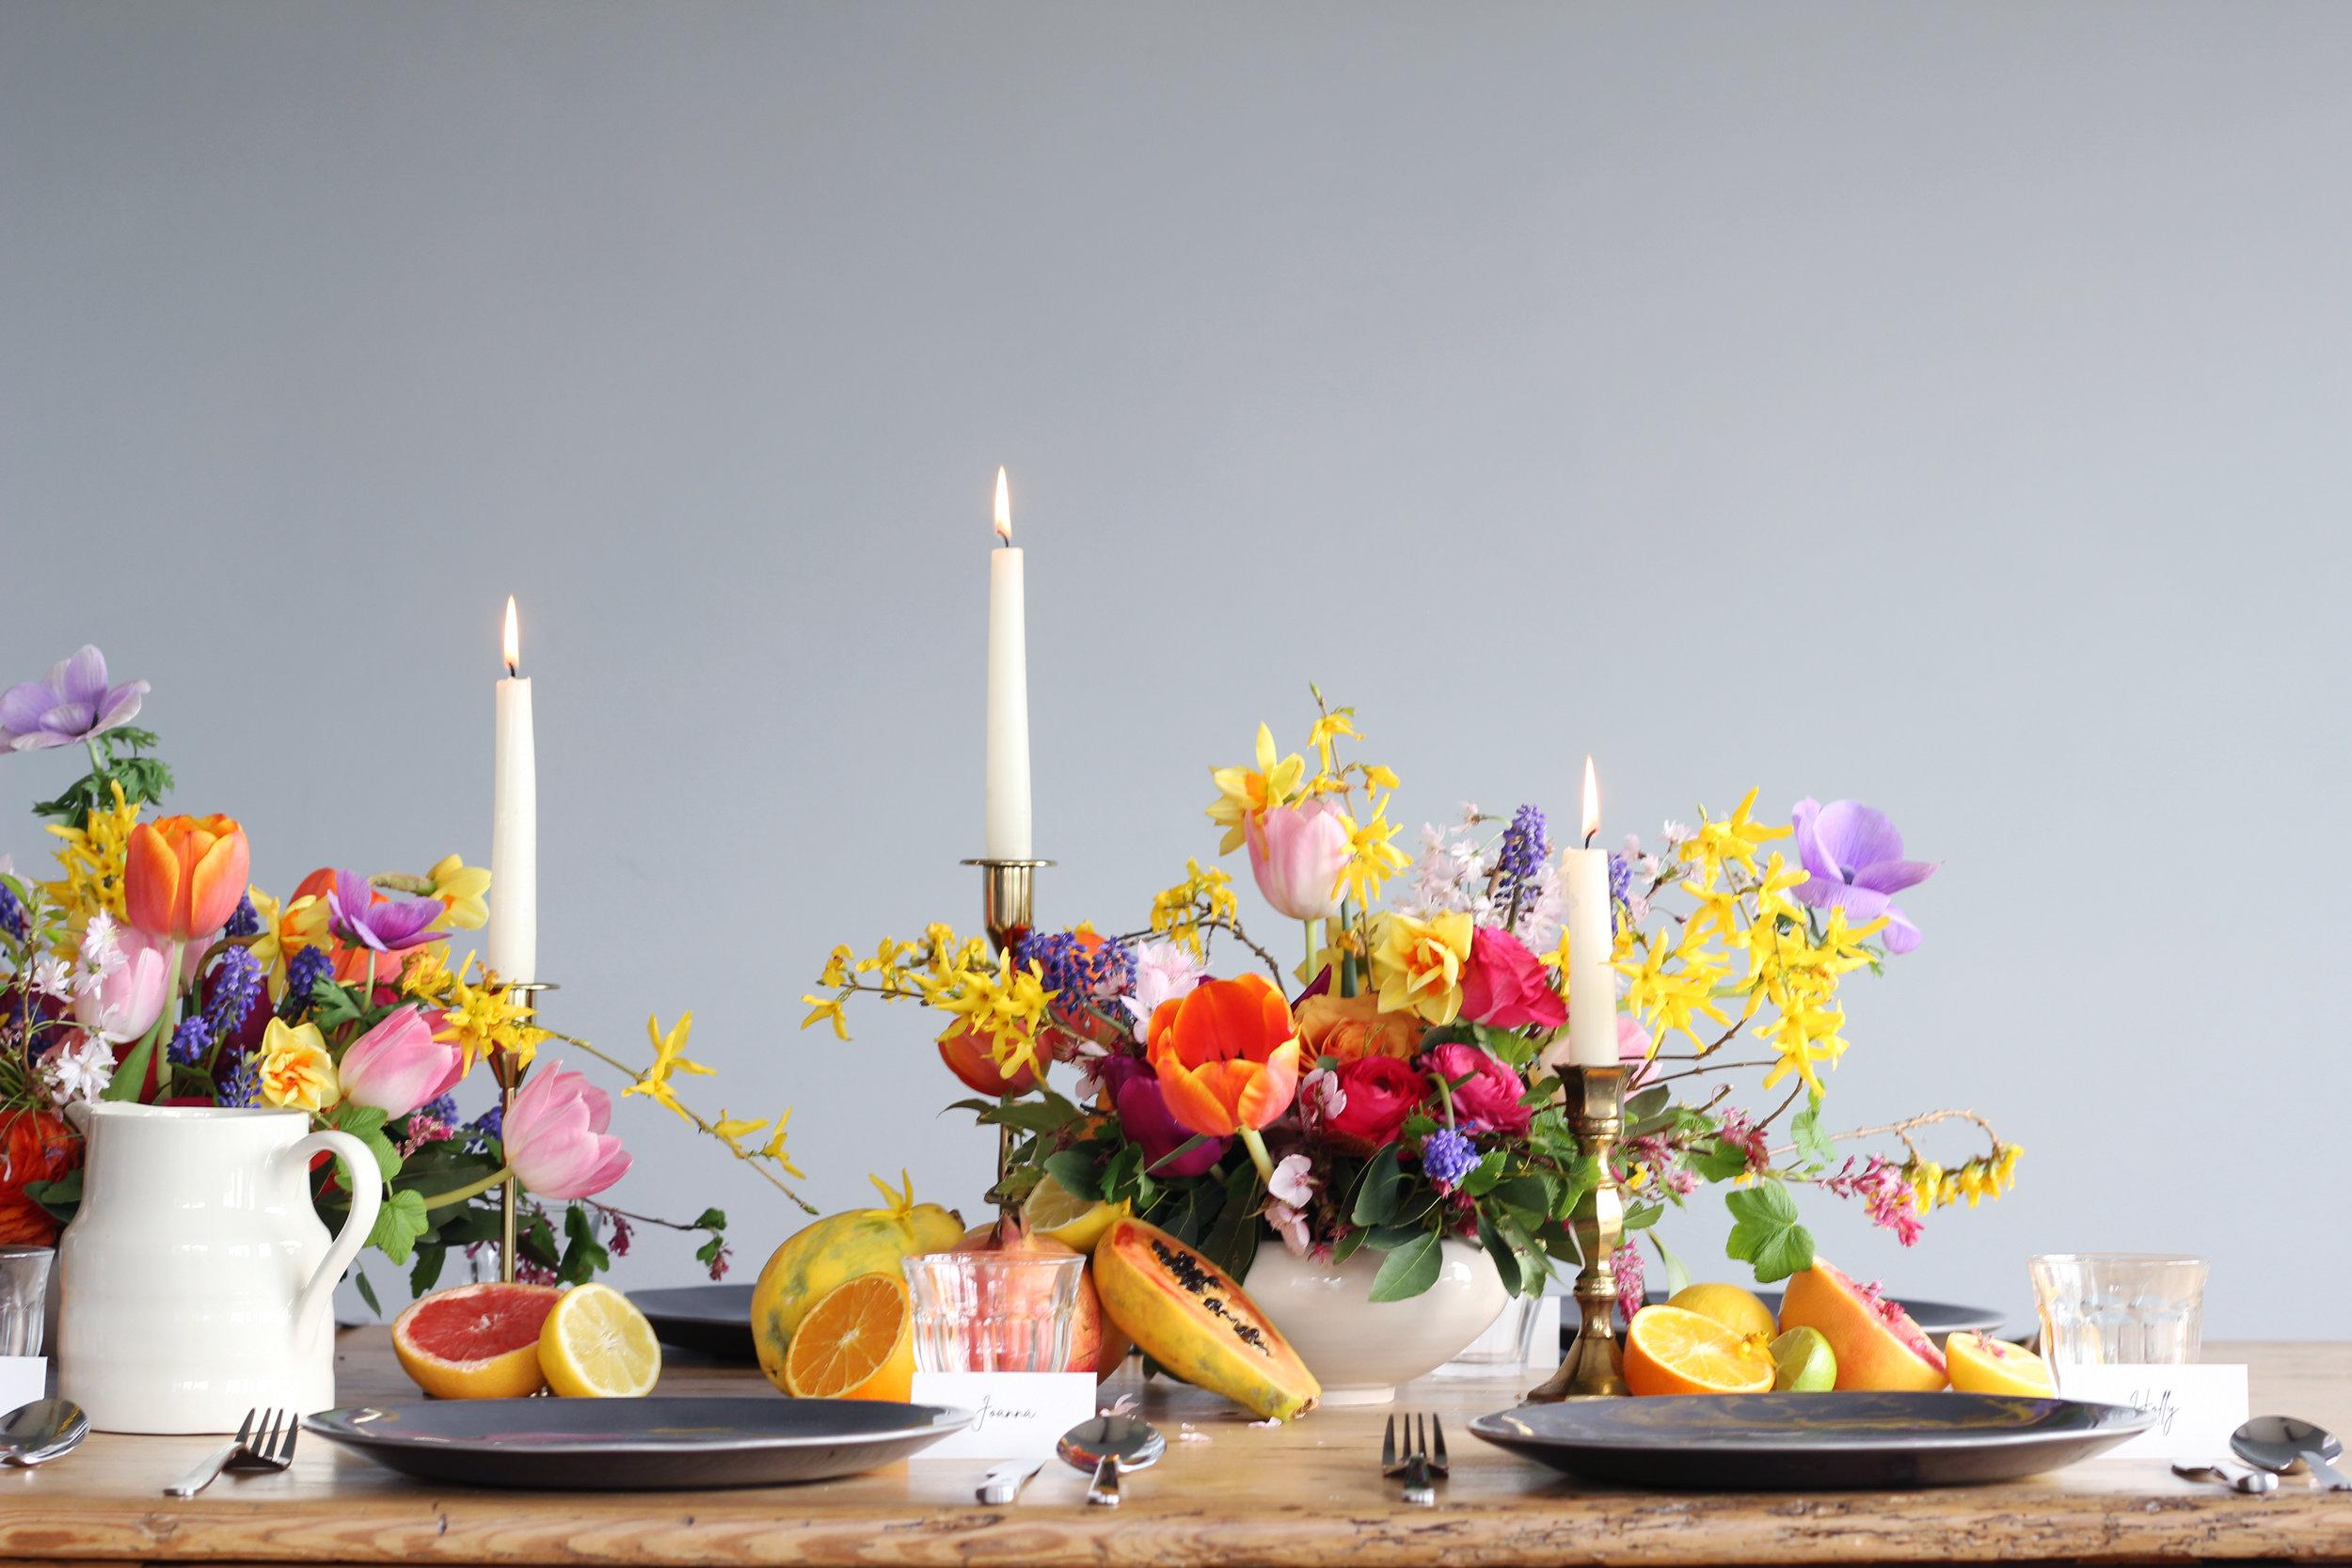 Callie-Pettigrew-Fruity-Florals-14.jpg